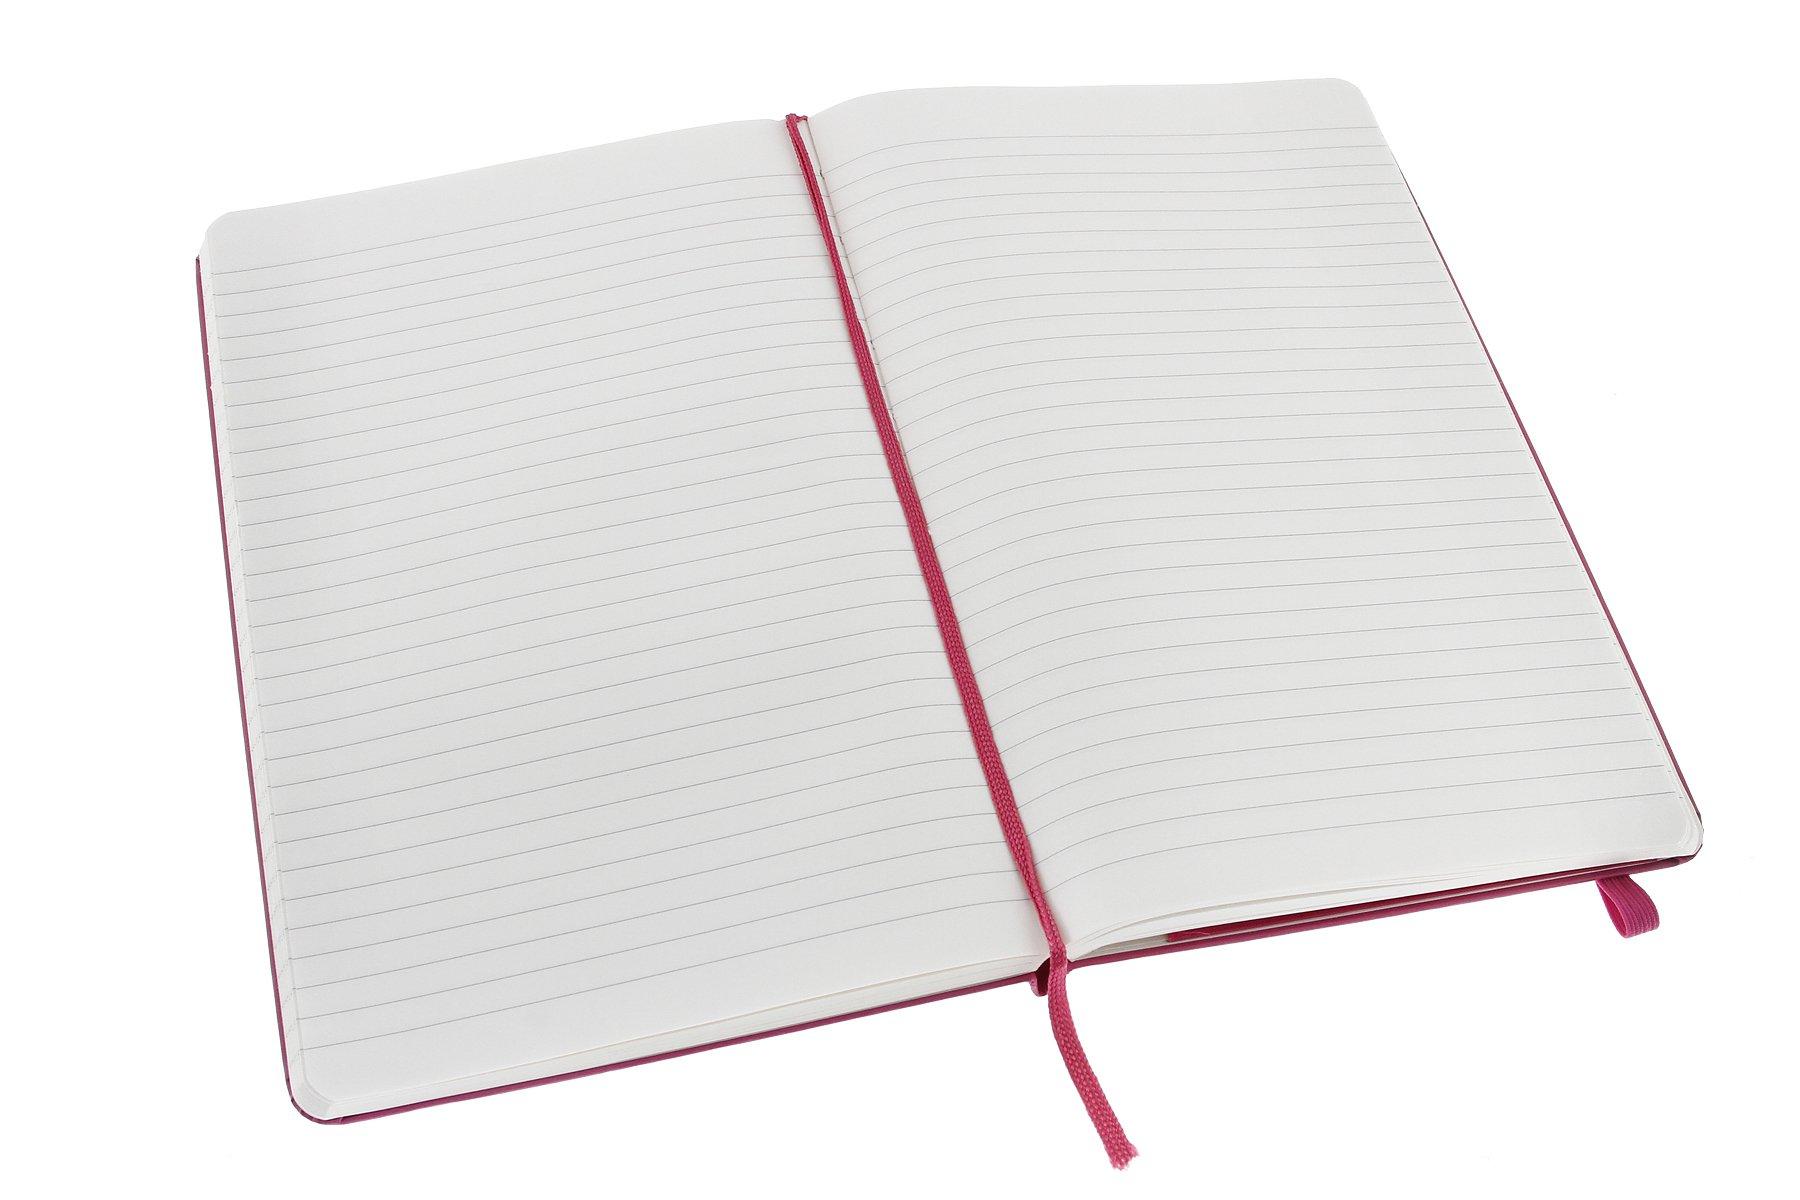 Moleskine Classic Notebook, Large, Ruled, Magenta, Hard Cover (5 x 8.25)